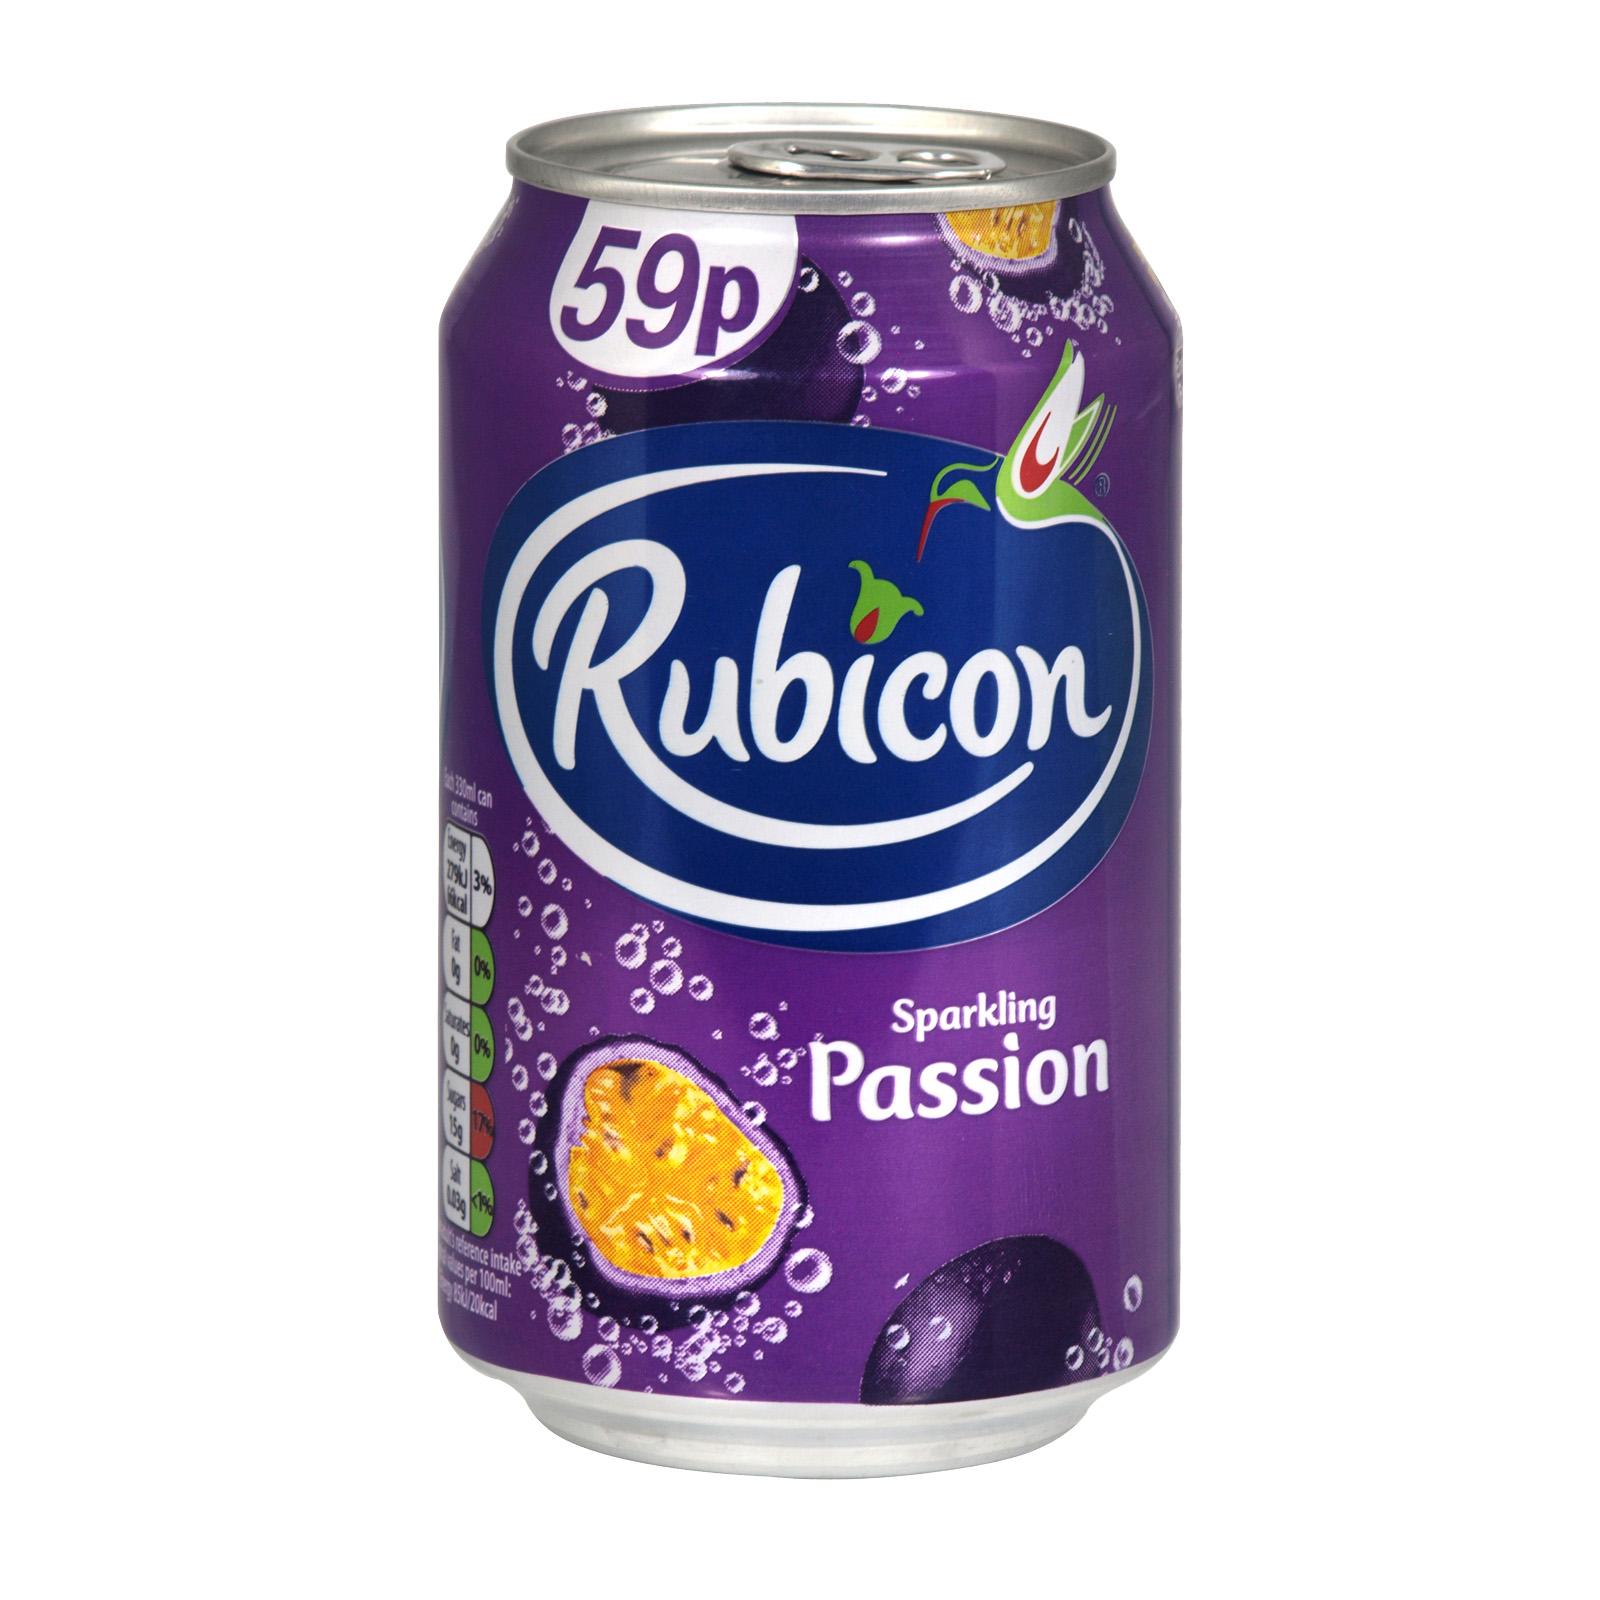 RUBICON CANS PM 59P PASSION